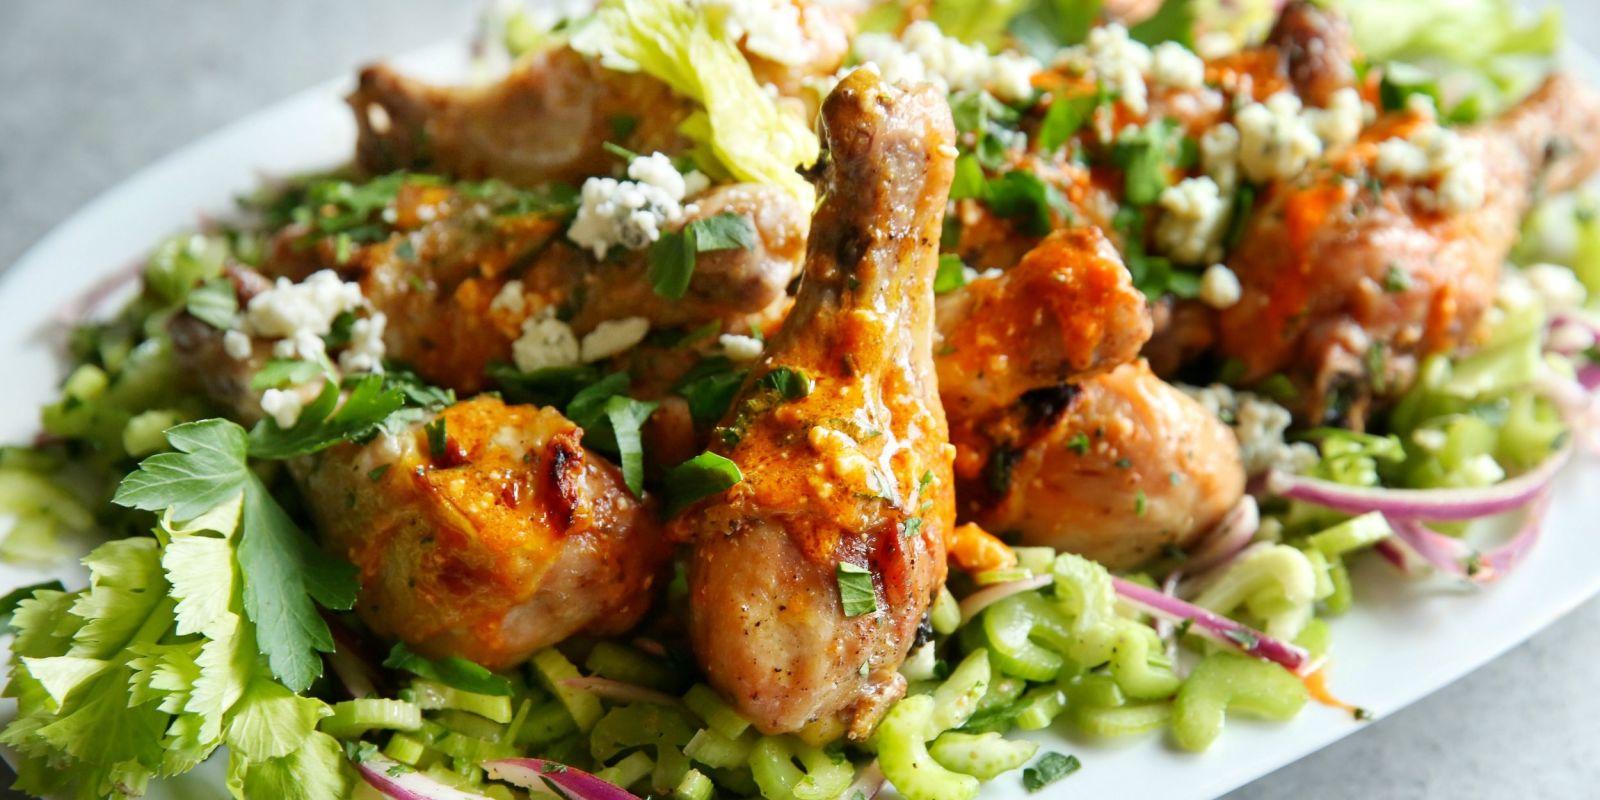 best buffalo chicken drumsticks with celery salad recipe delish com